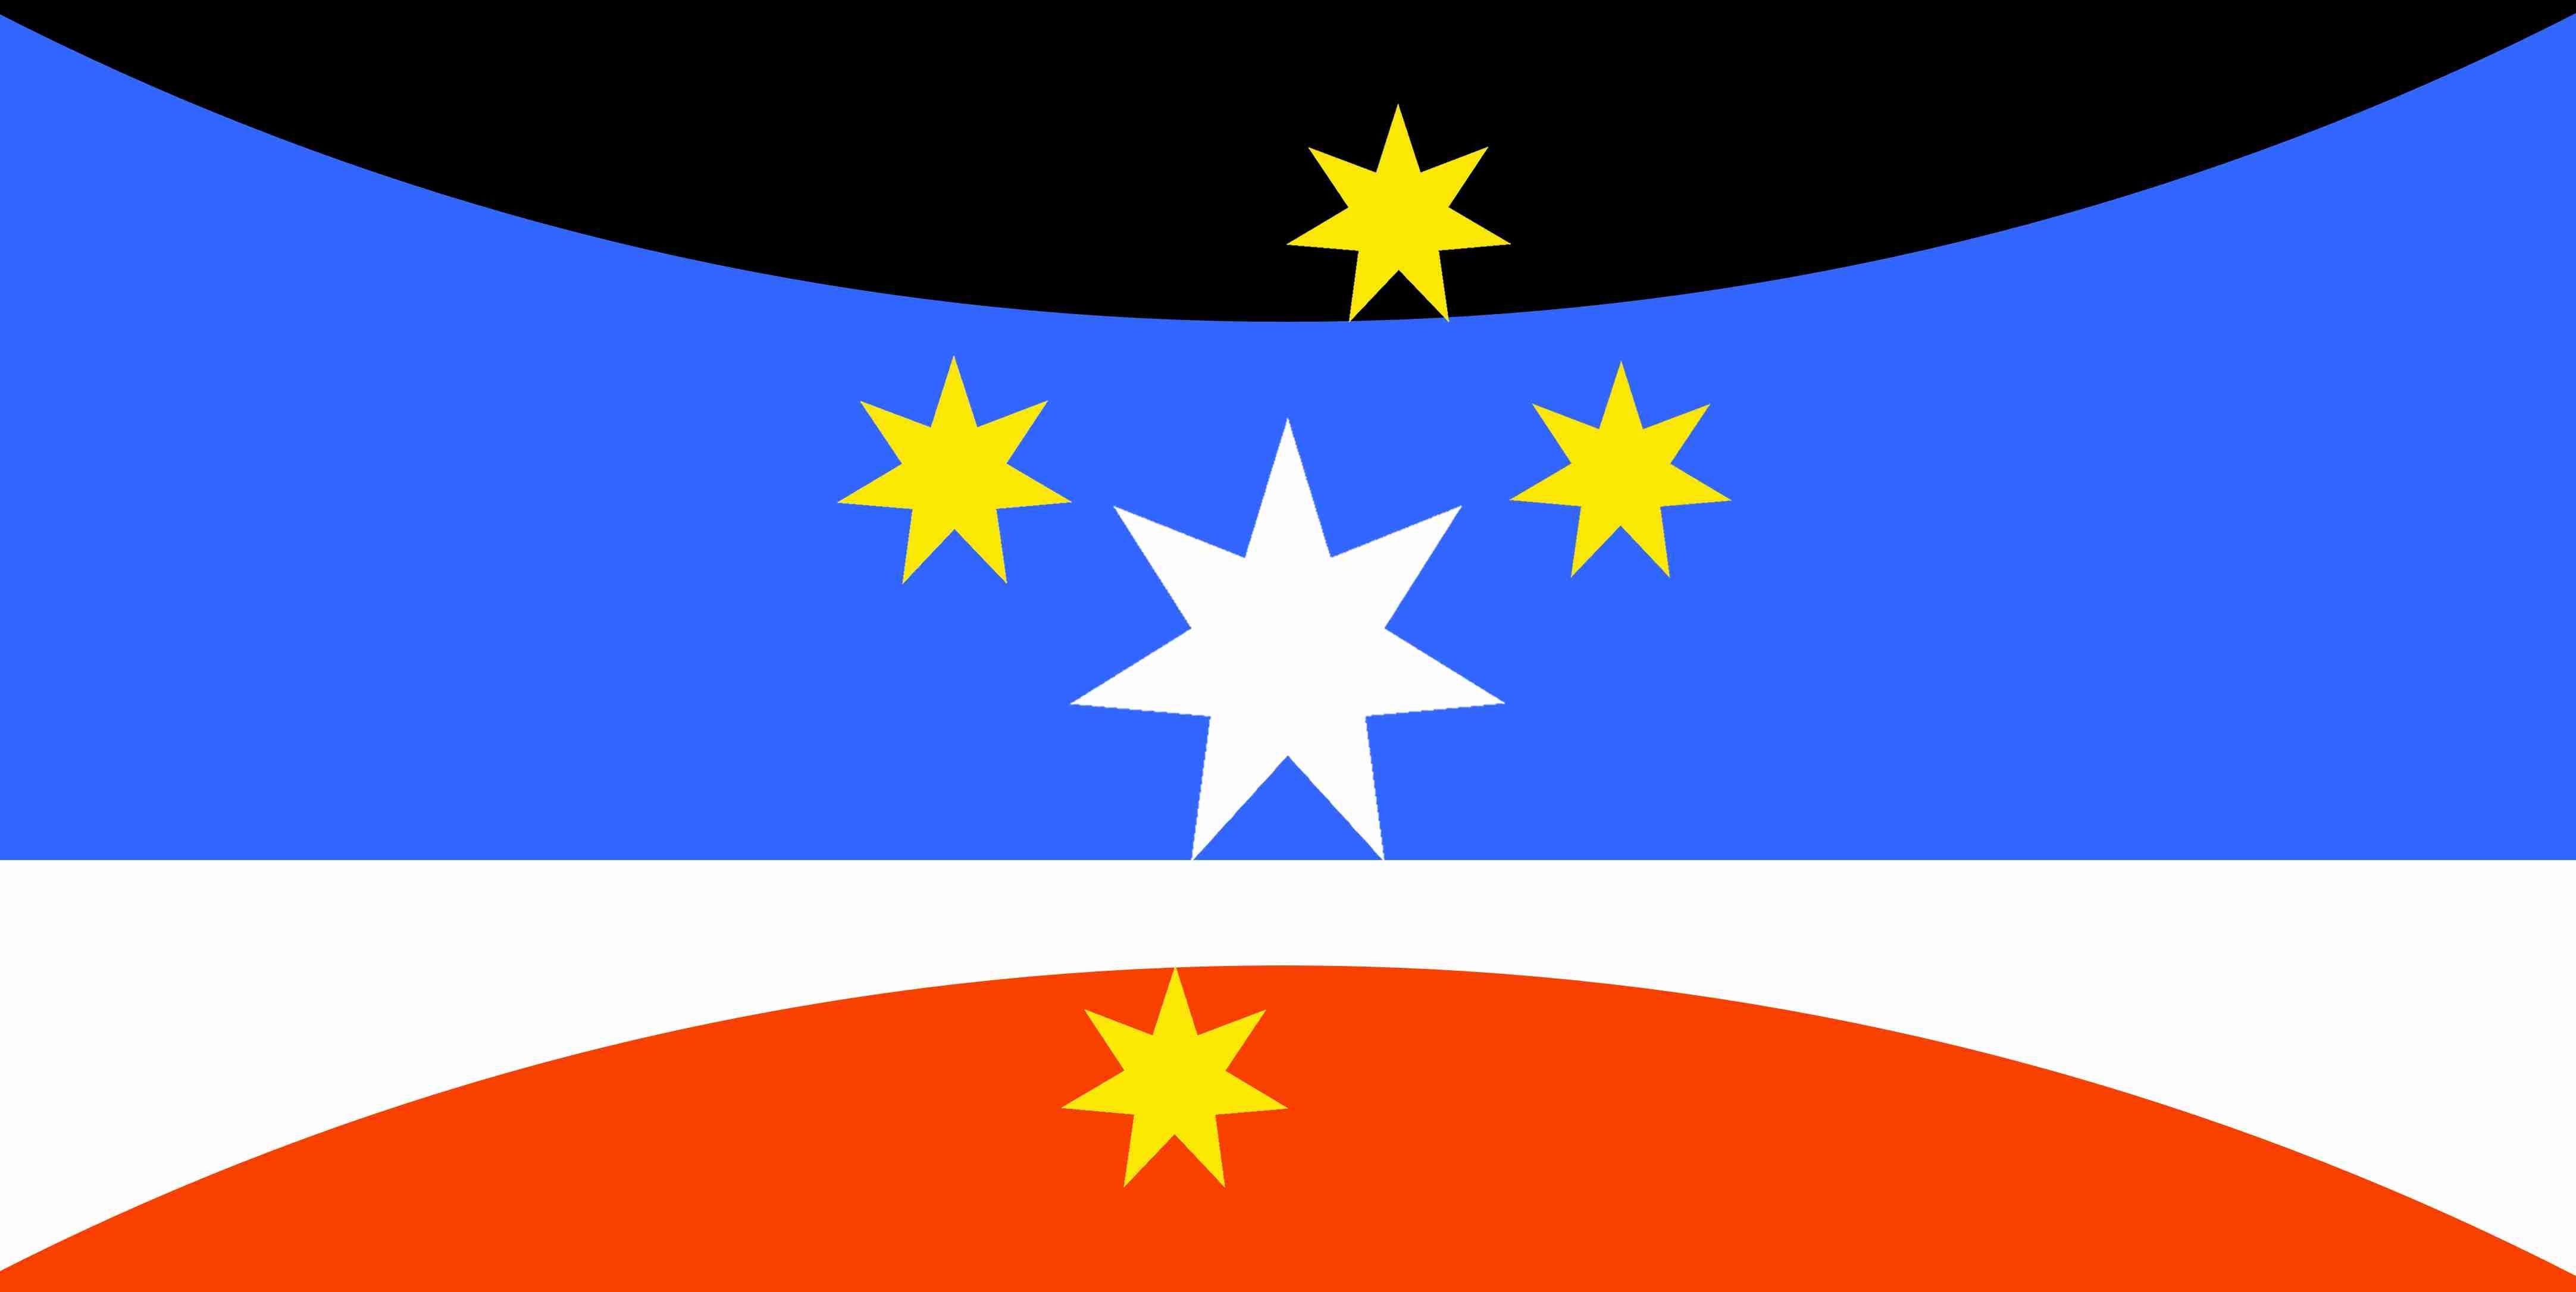 new Australian Flag design series - UluruSky17-Horizon-GoldSC-CS ...